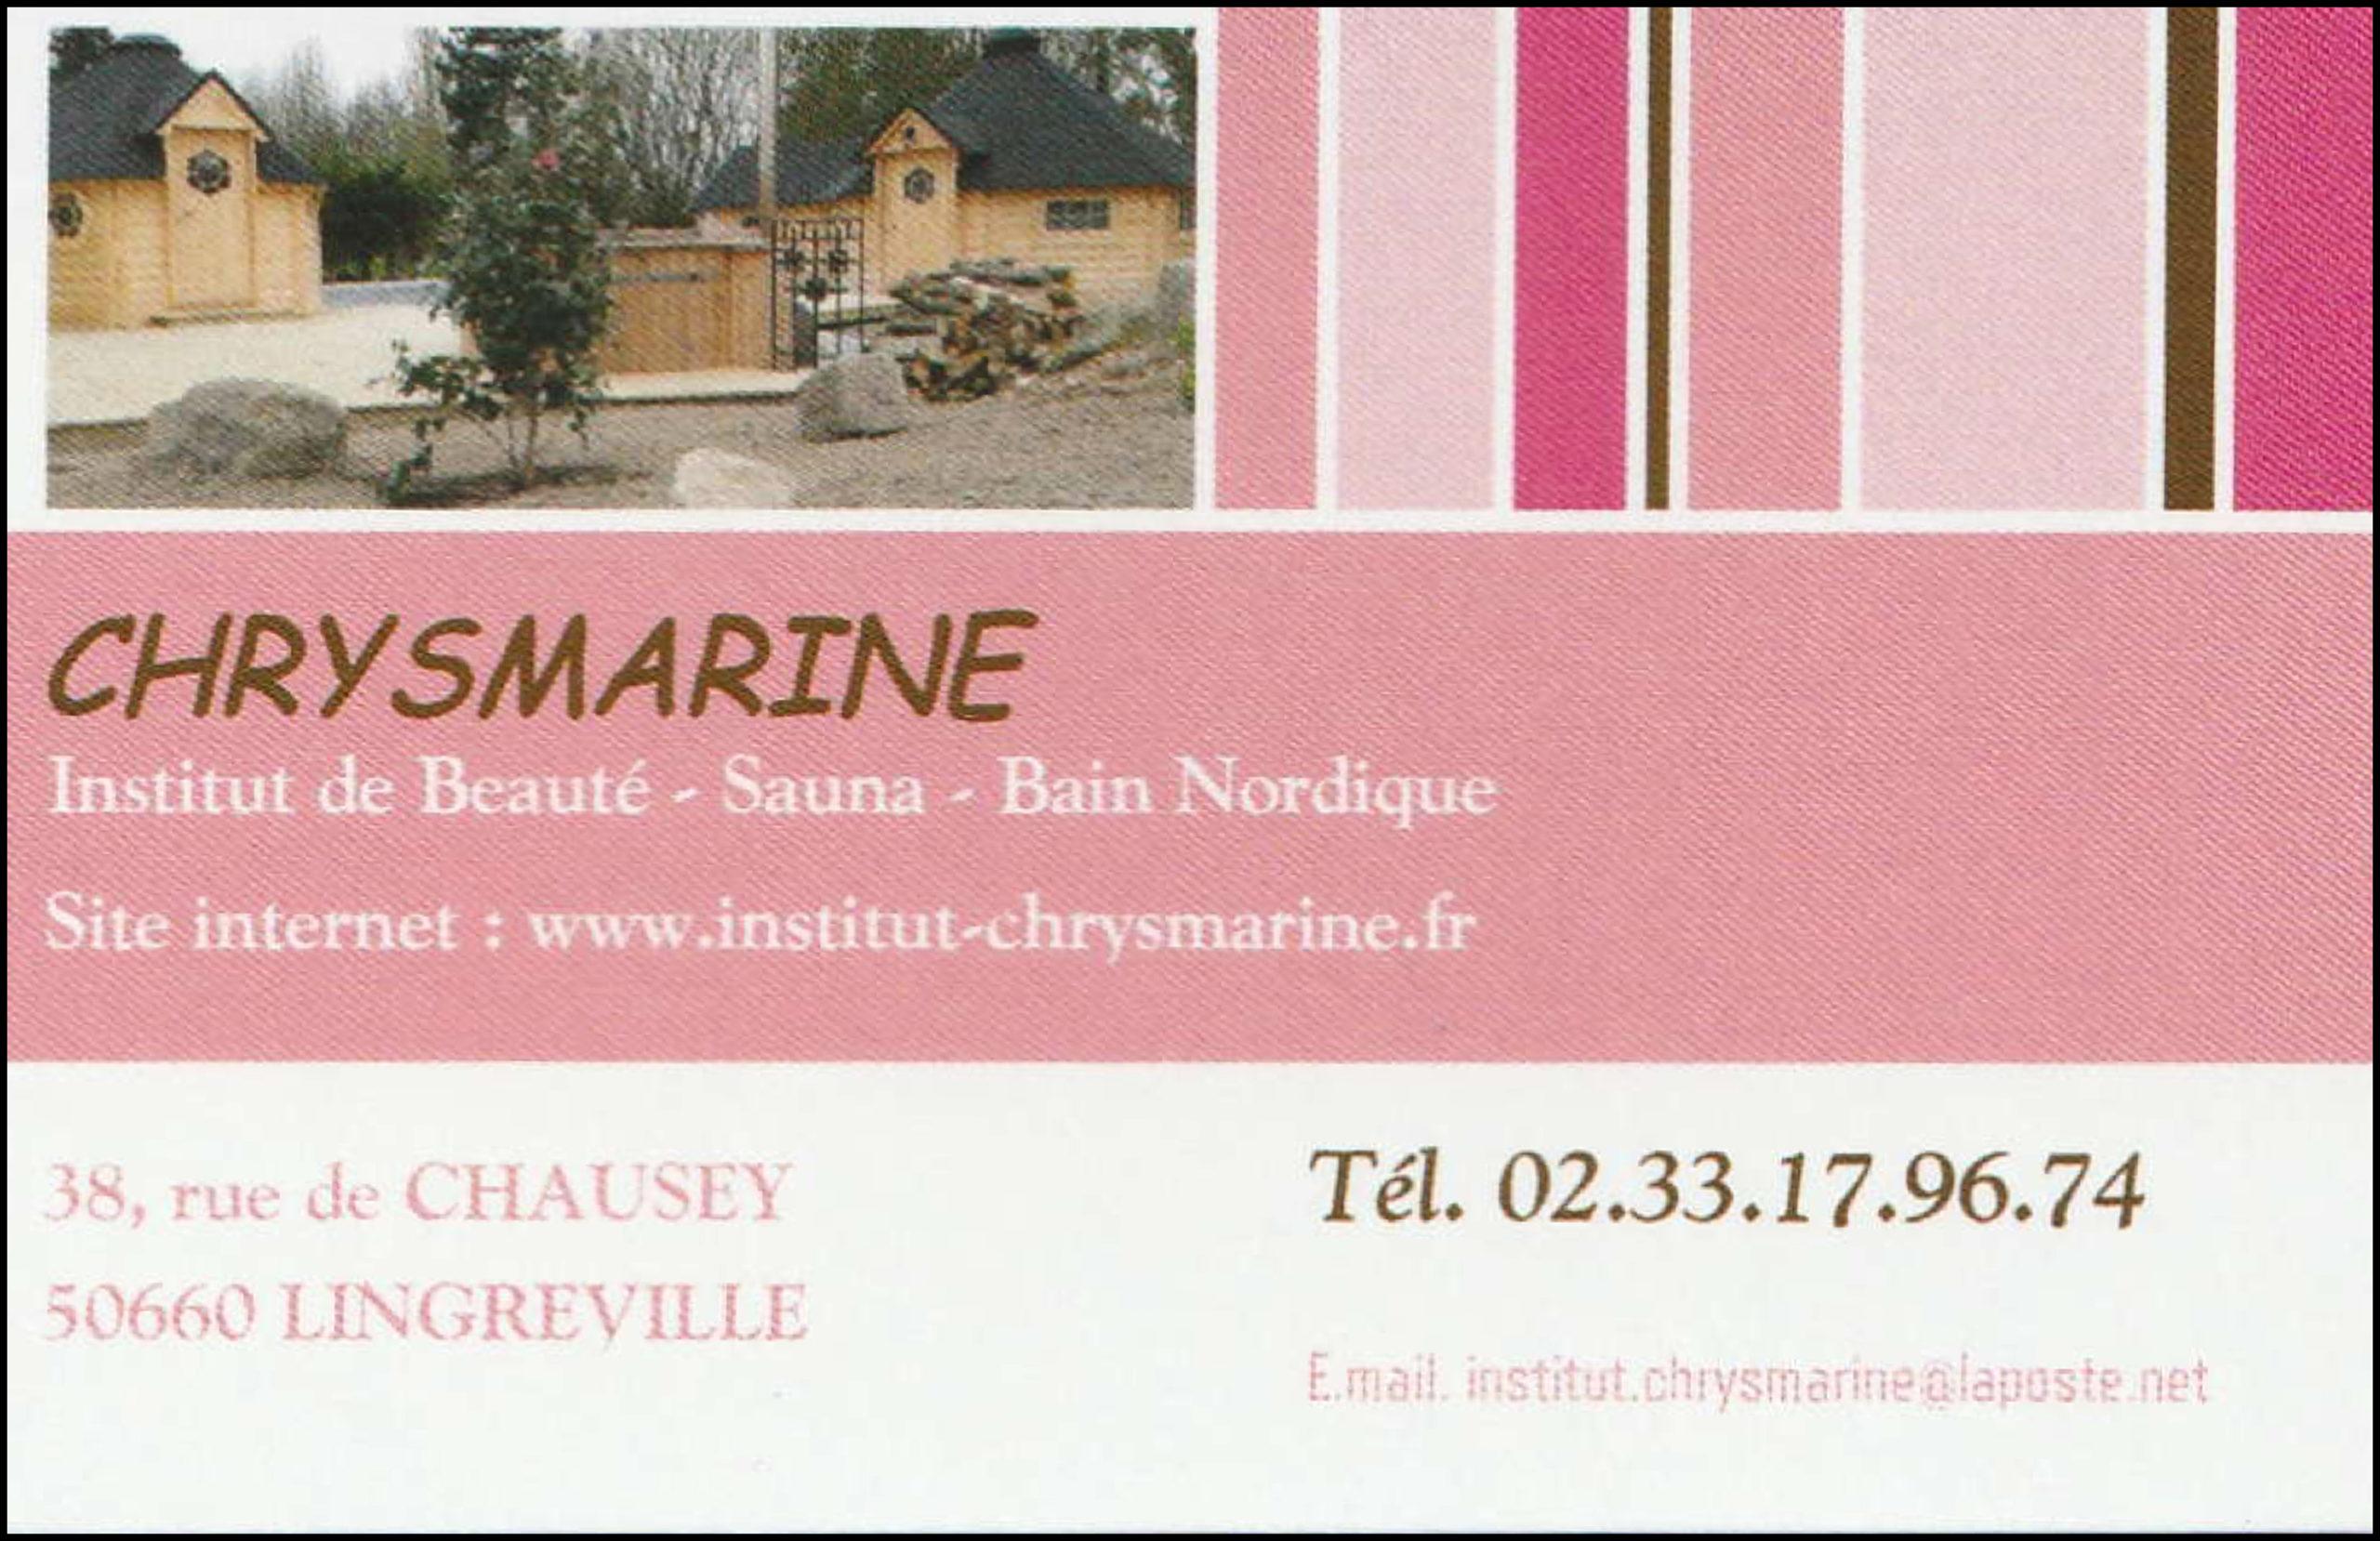 Chrysmarine